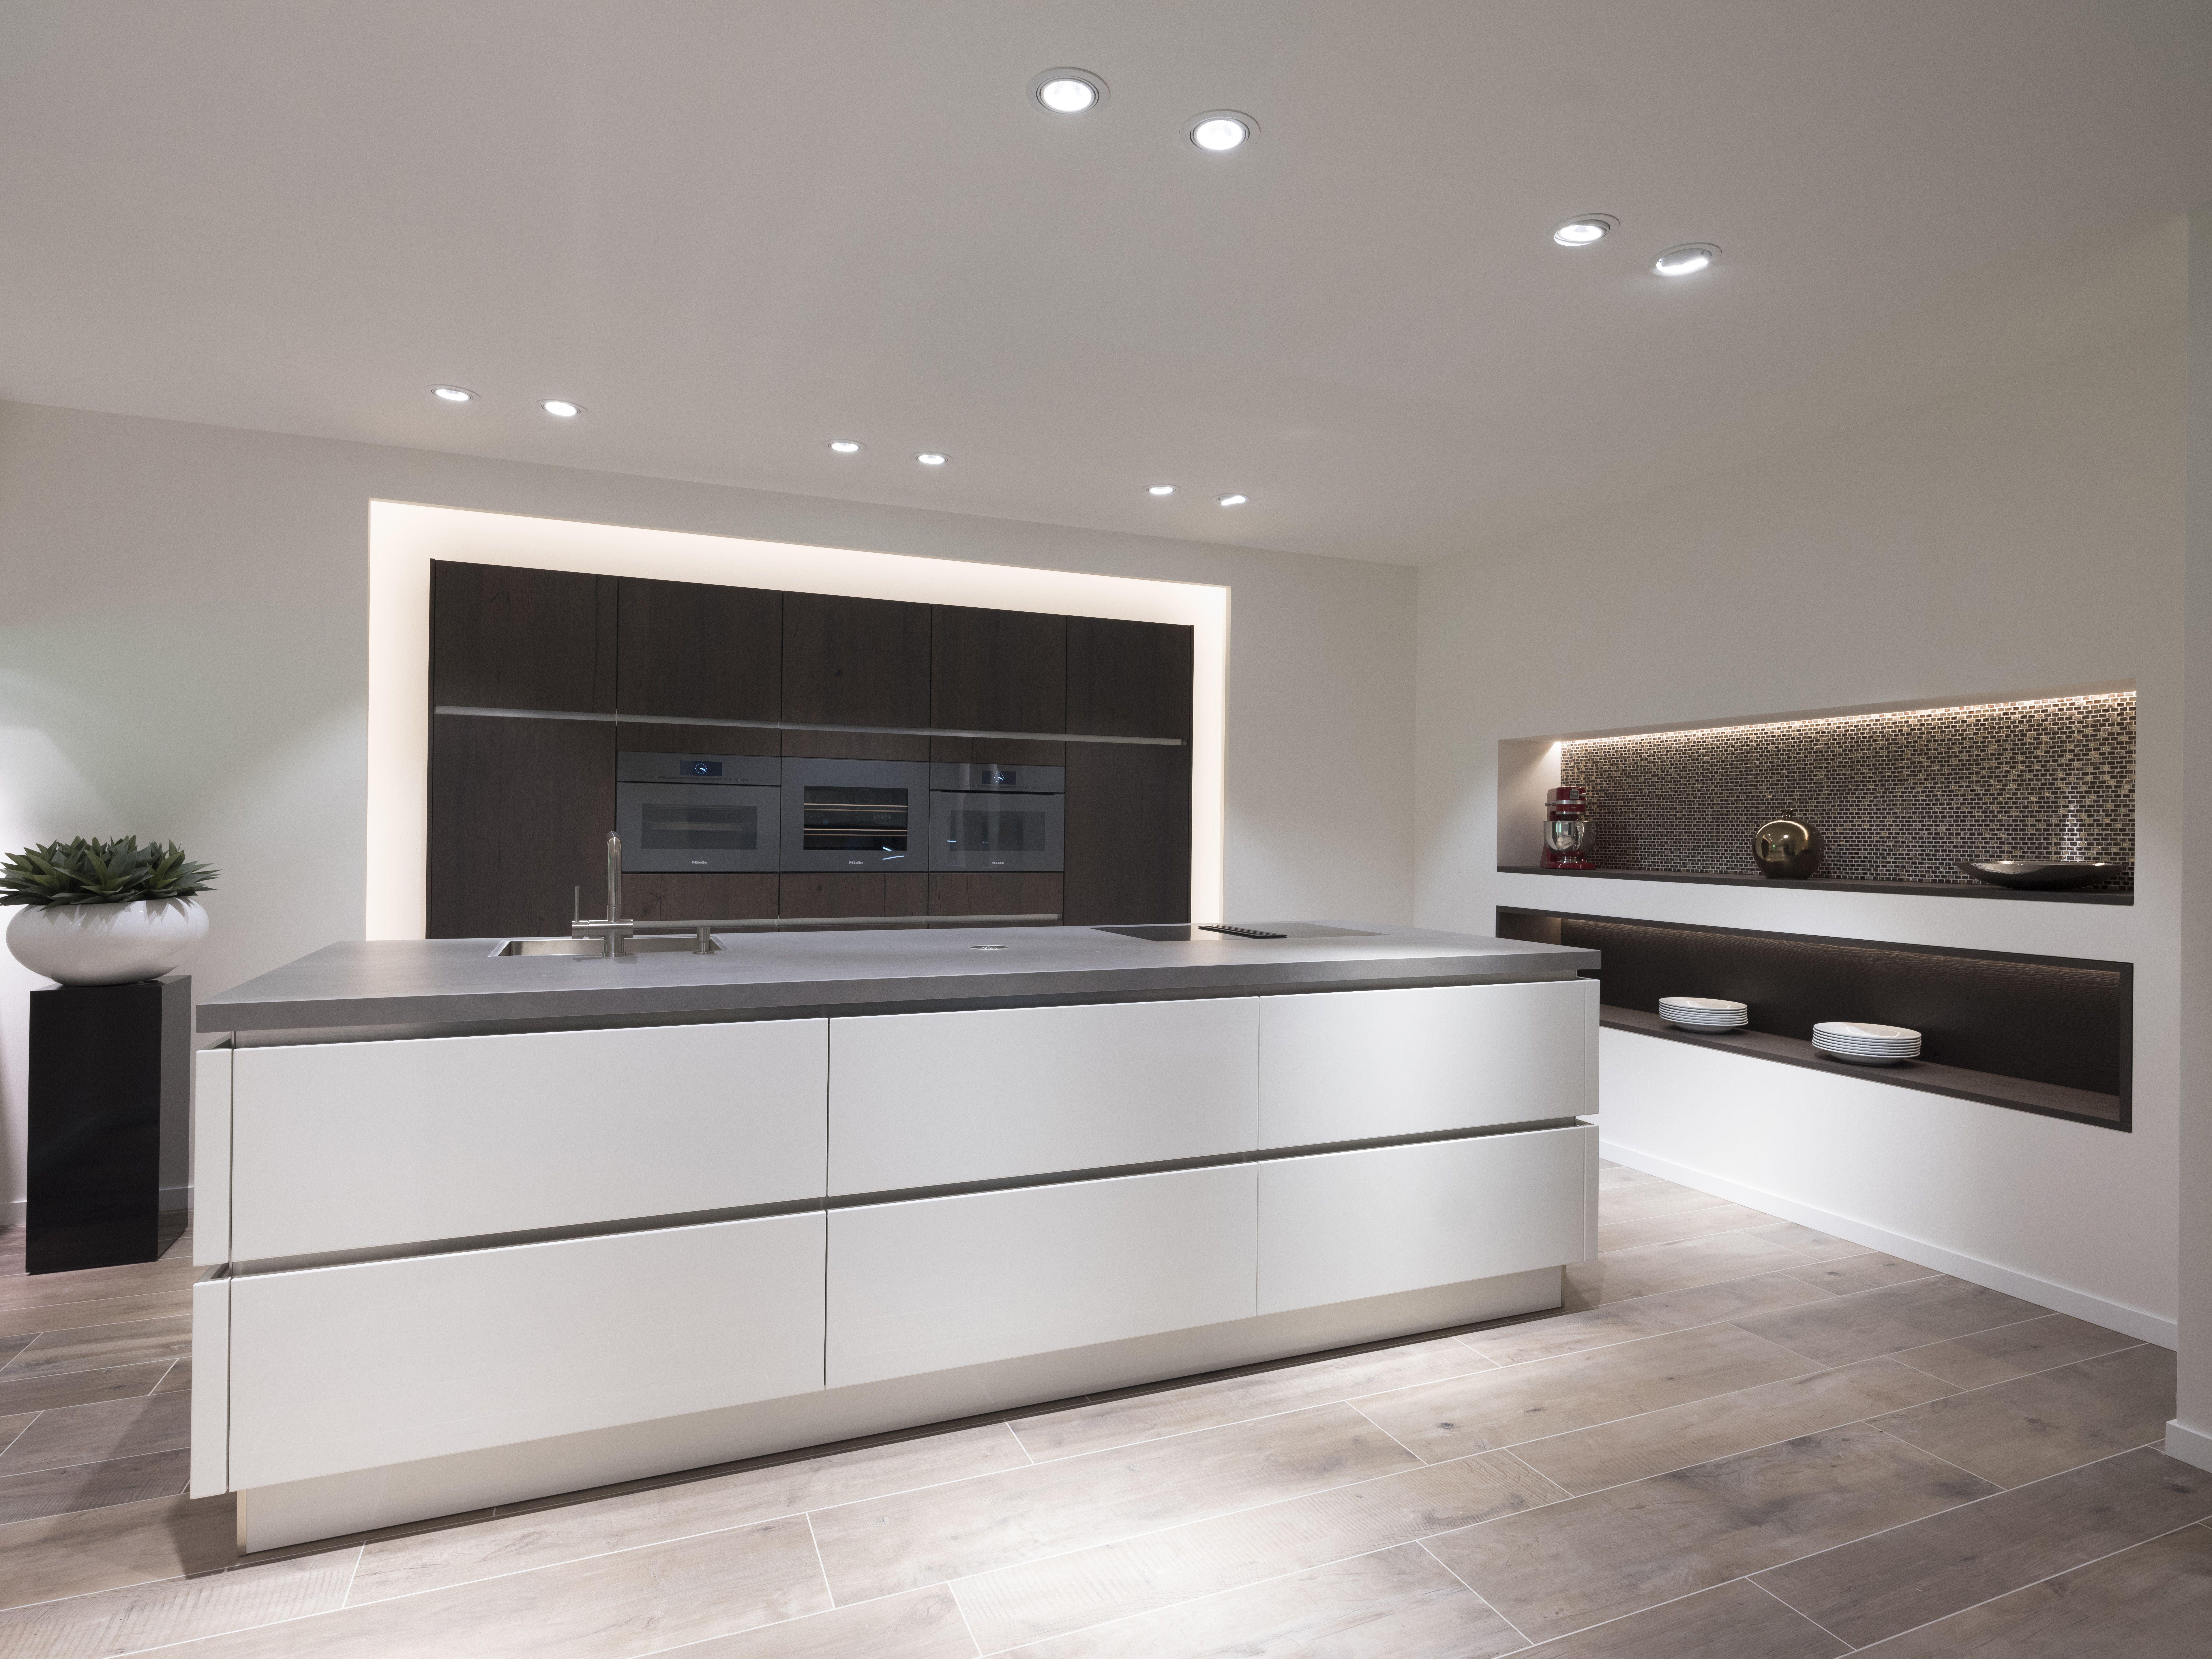 Hedendaags Moderne keuken met eiland - Aufour, moderne keukens op maat RZ-12